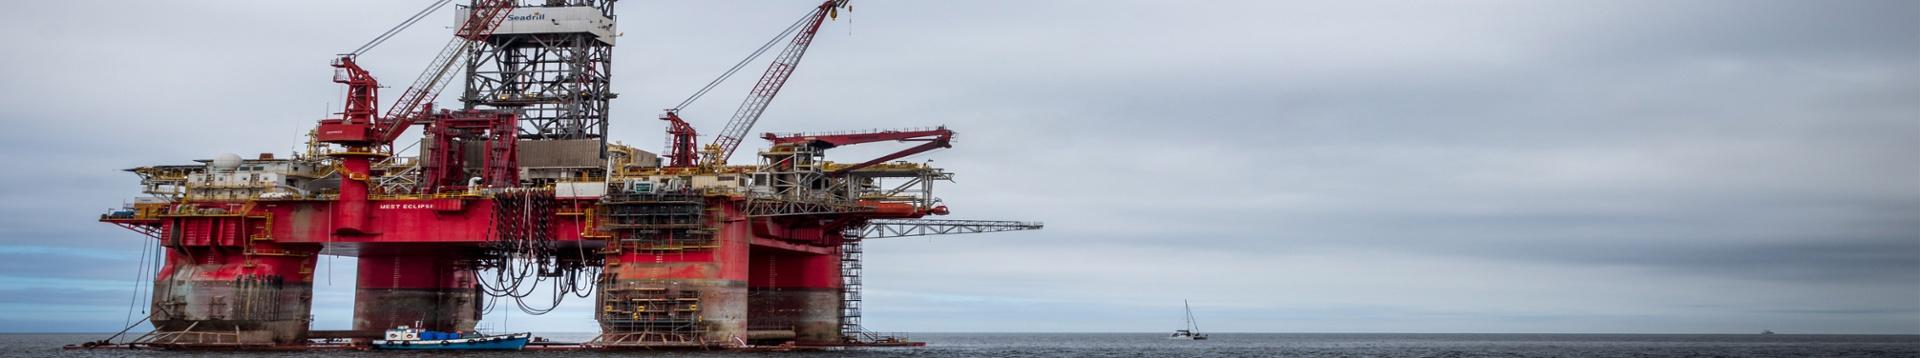 banner-industry-oil-1